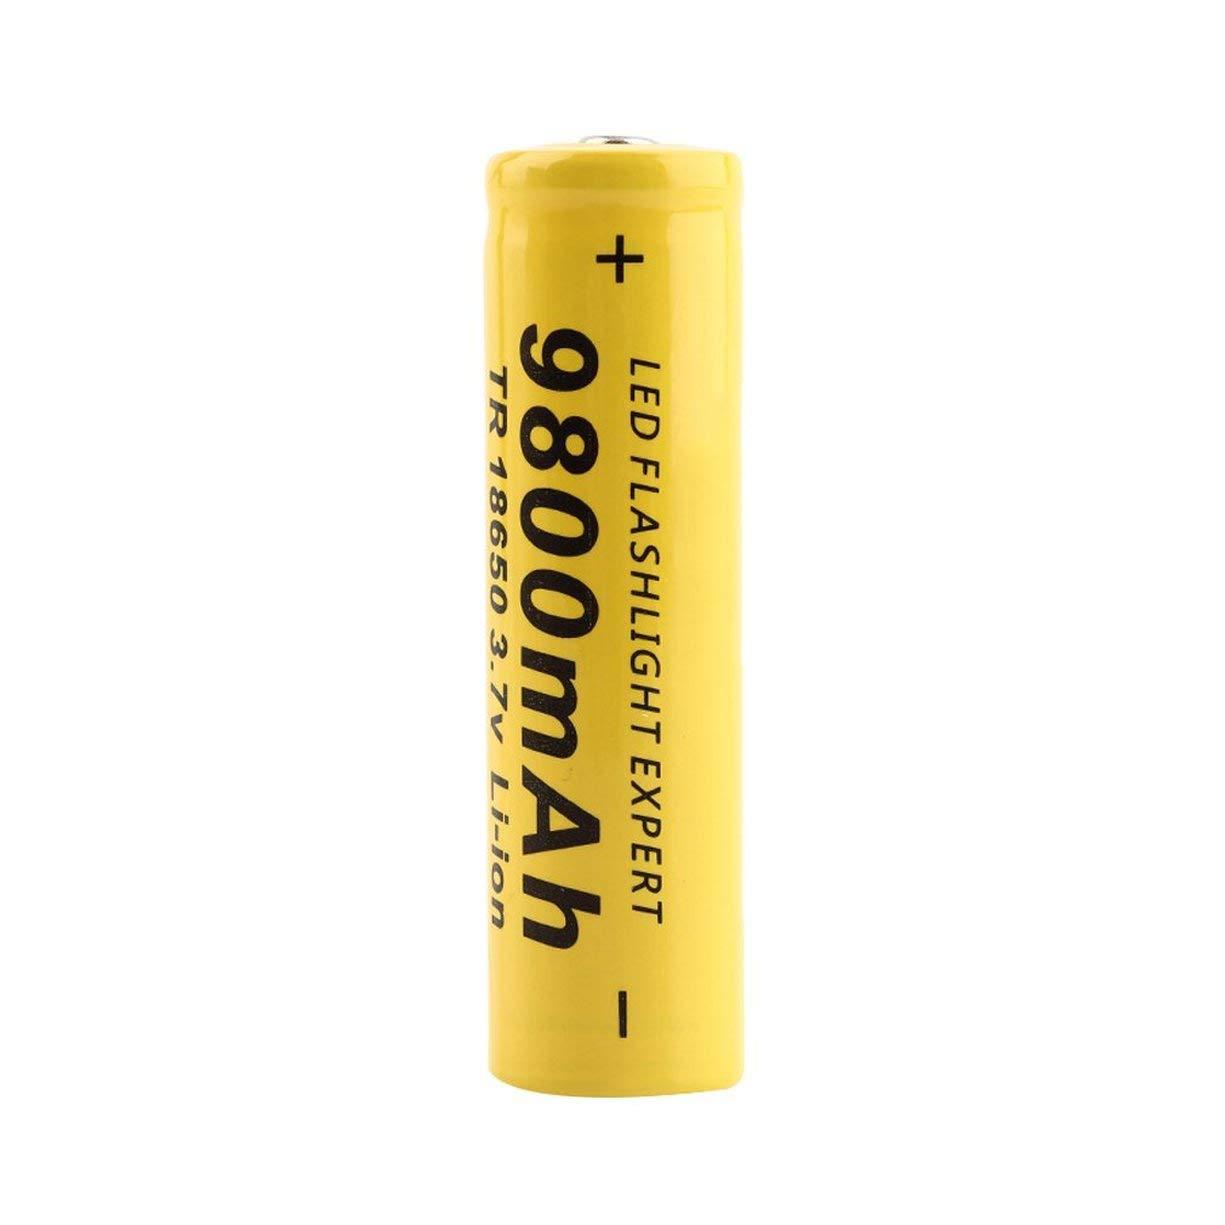 3.7V 9800mAh Li Ion Akku, 3.7V 18650 9800mAh Kapazitä t Li Ion Akku fü r Taschenlampe Gelb Shell Battery Low wieder aufladen Detectoy